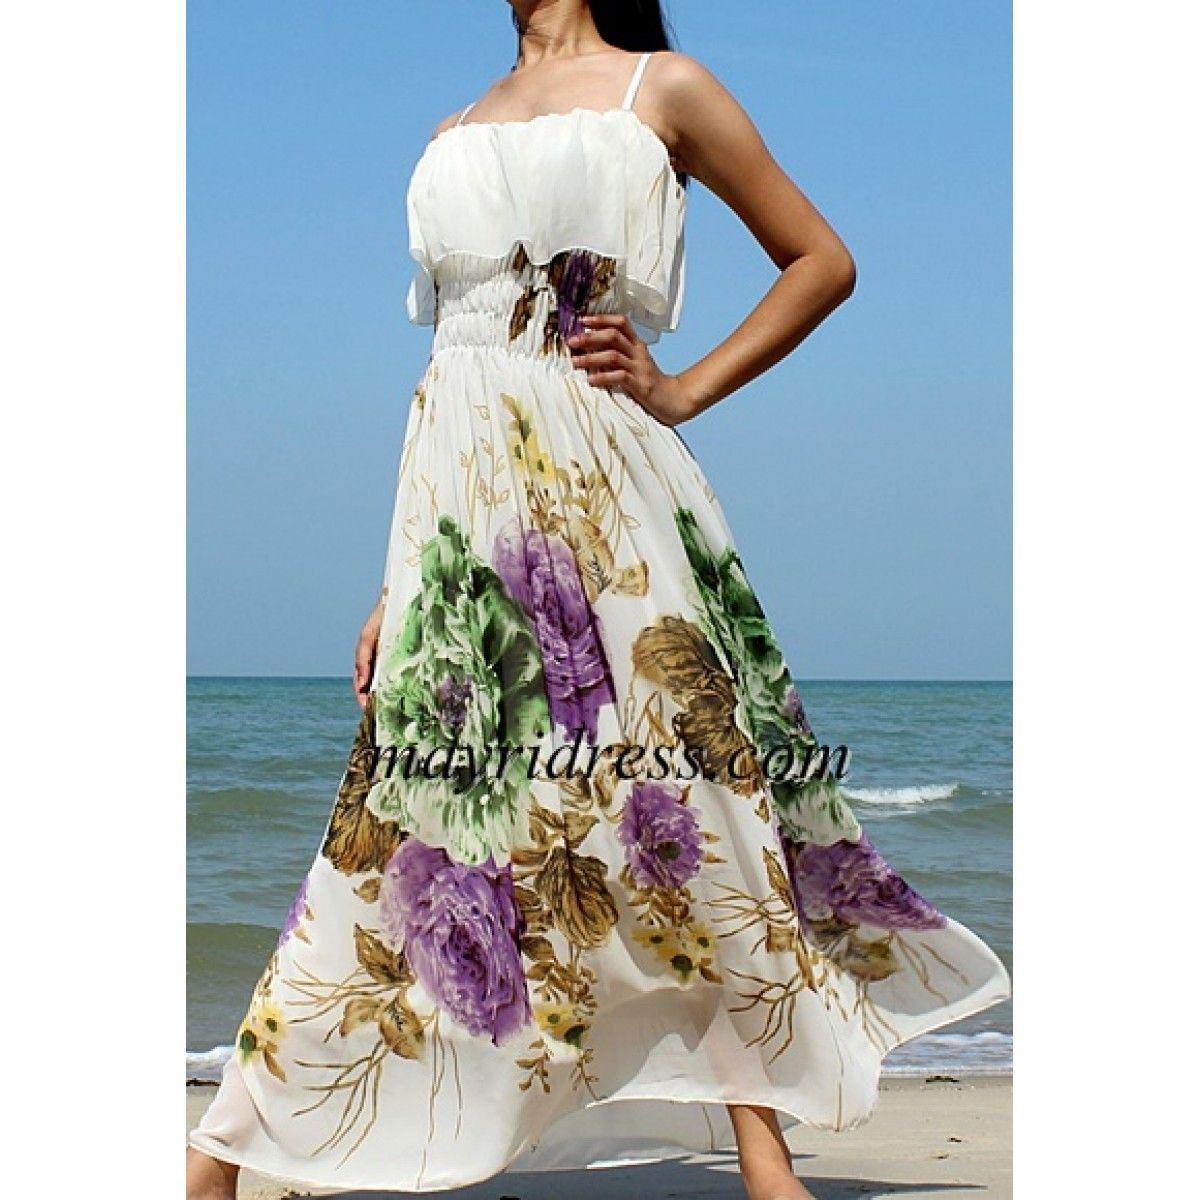 Colorful Fancy Dress Wedding Adornment - Wedding Dress - googeb.com